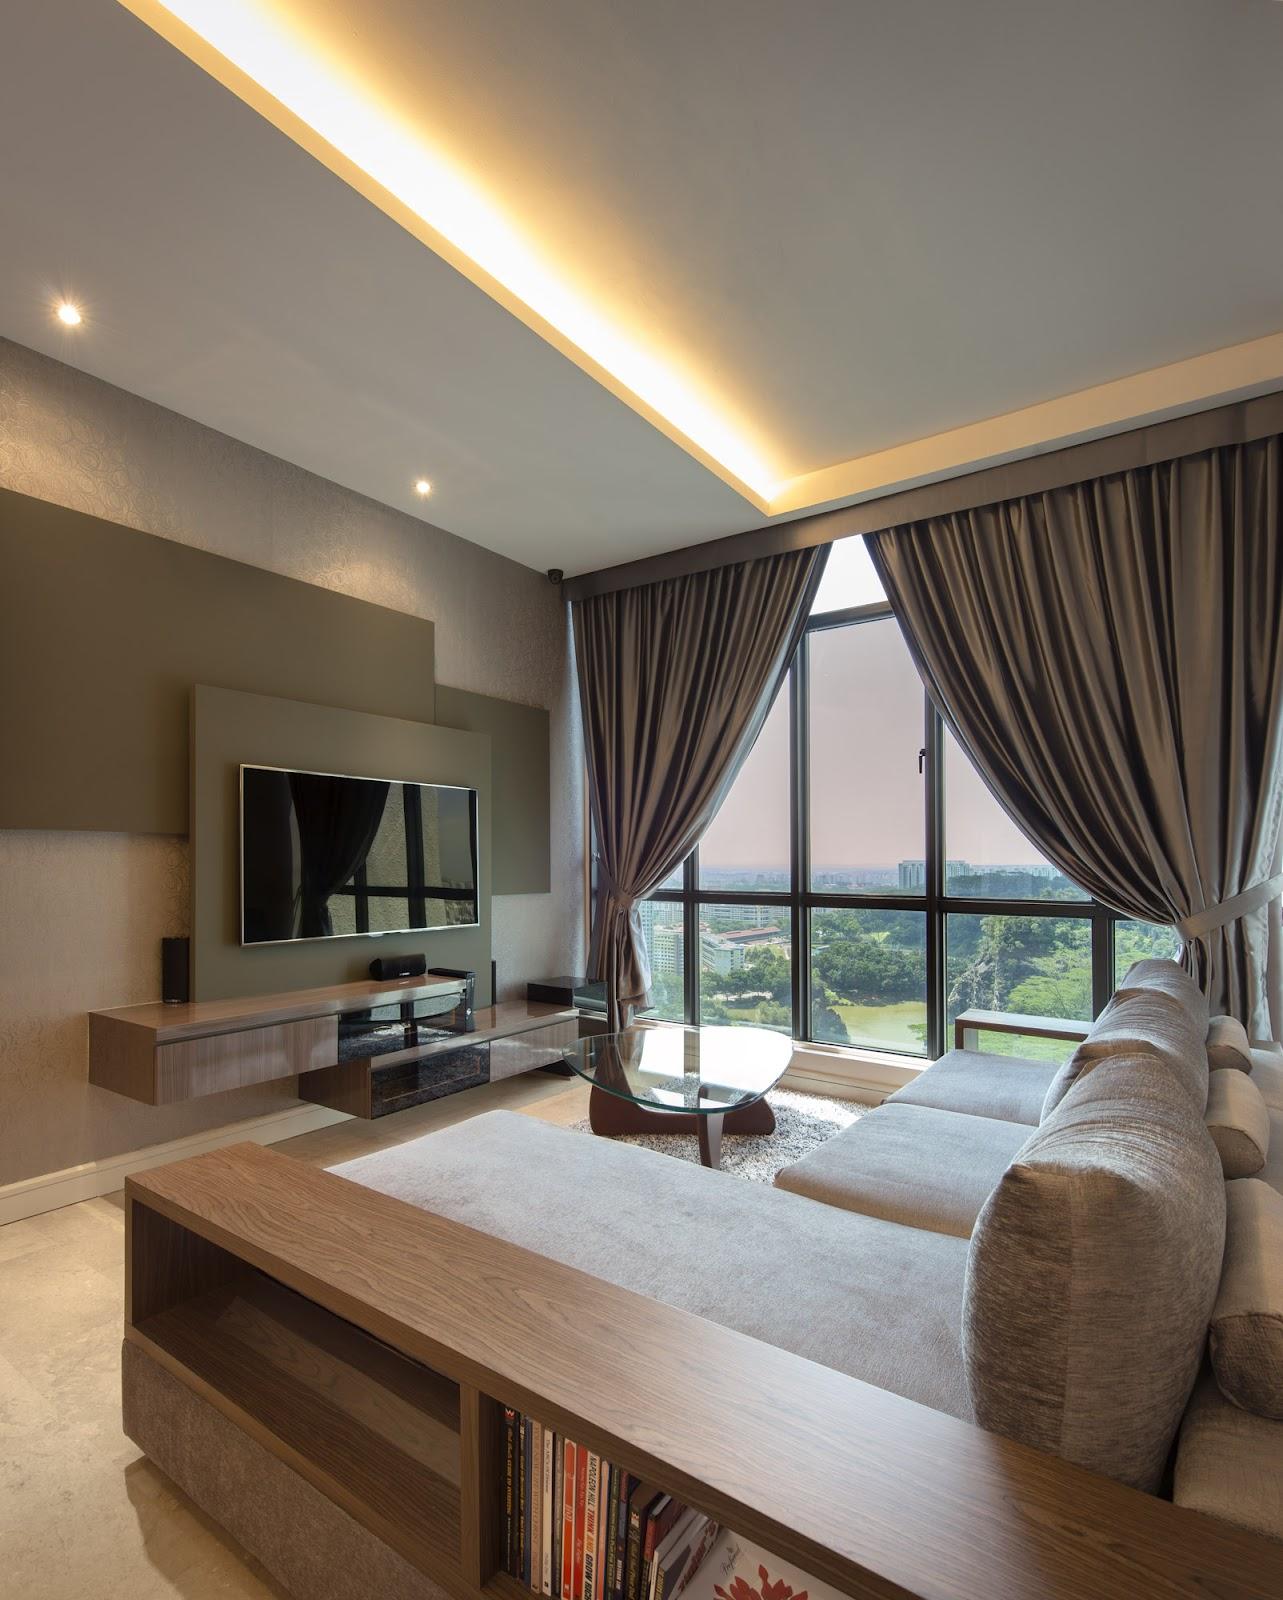 Rezt relax interior design regent heights condo project for Condo interior designs